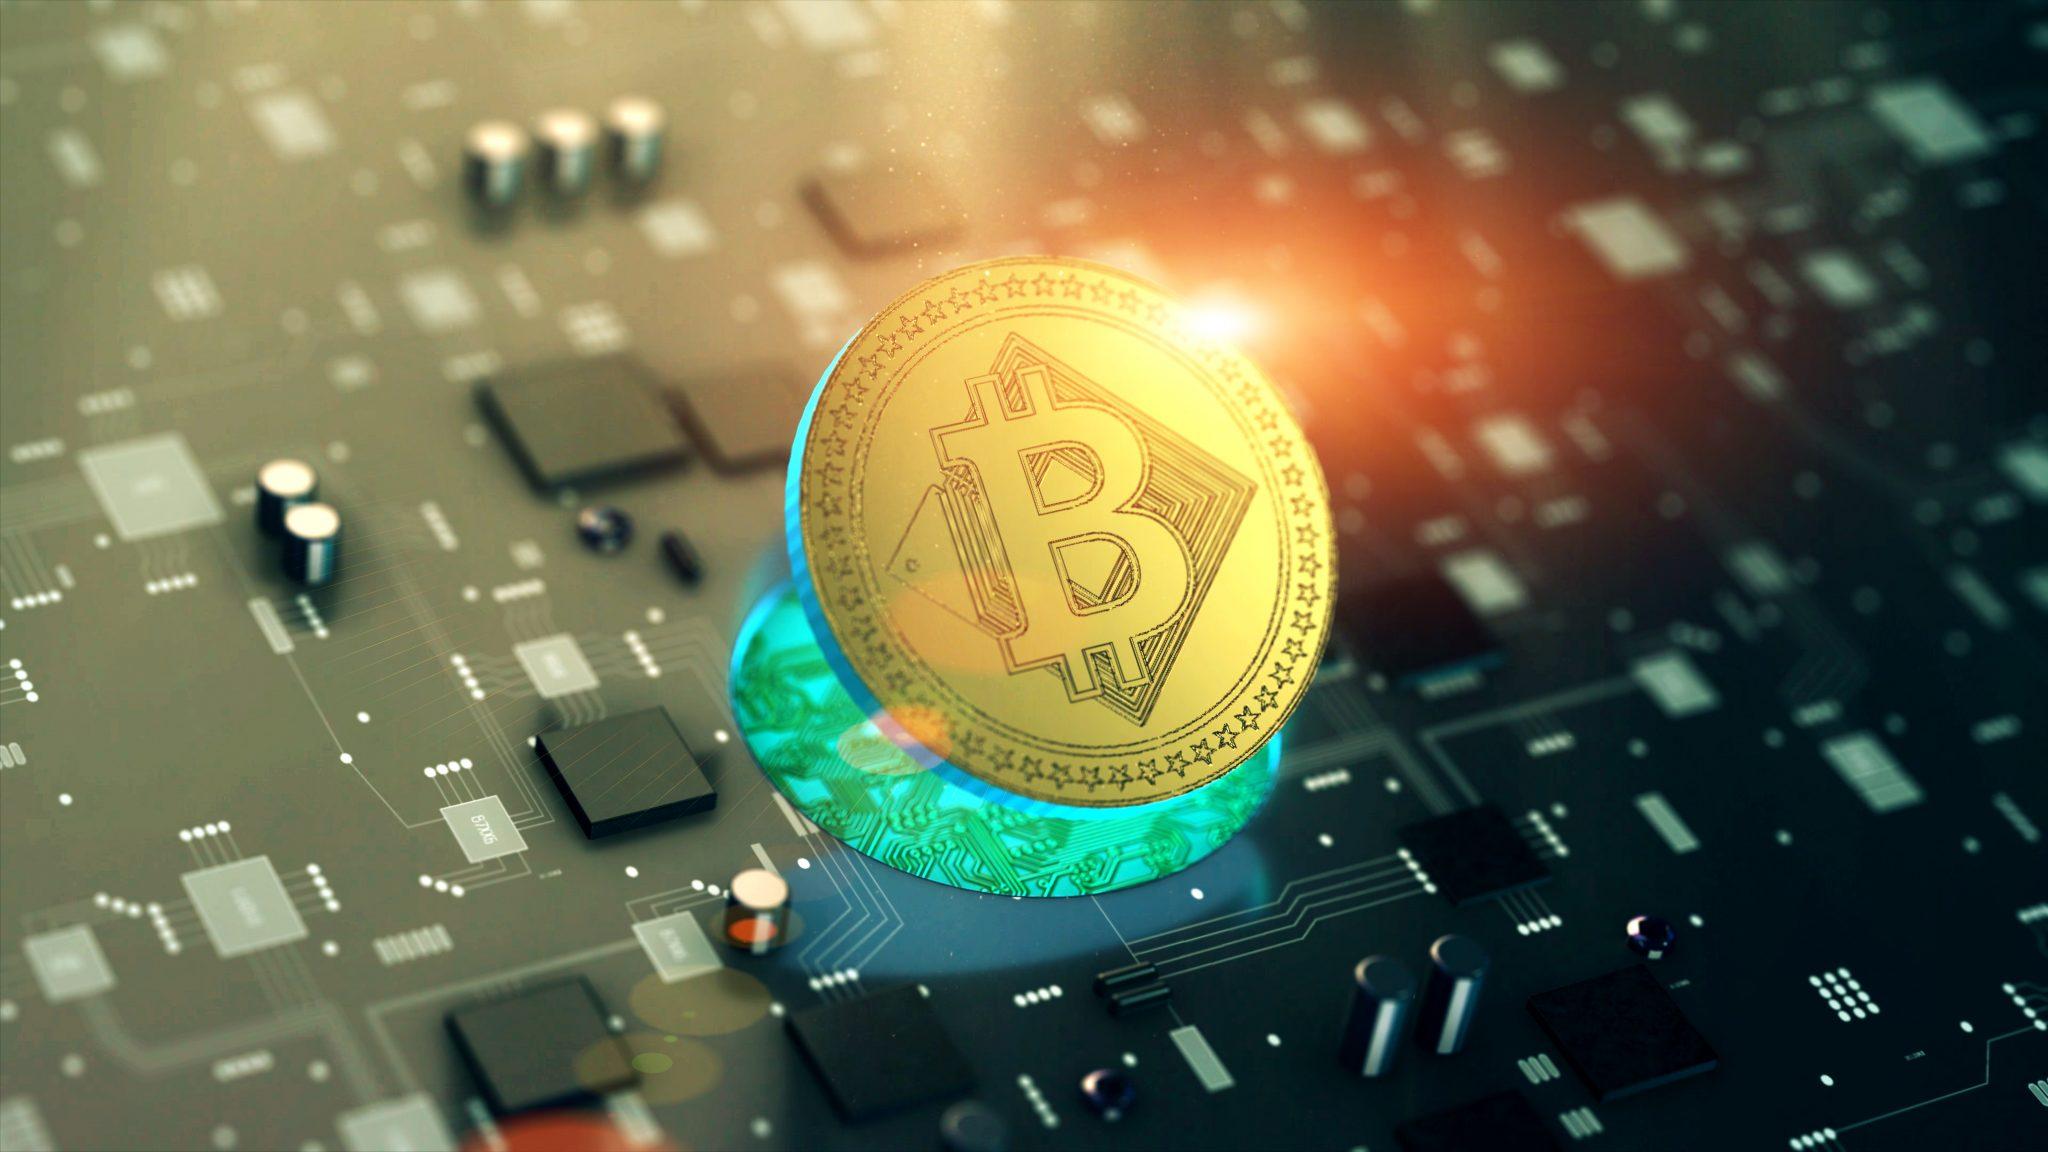 Digital cryptocurrency Bitcoin symbol on circuit board